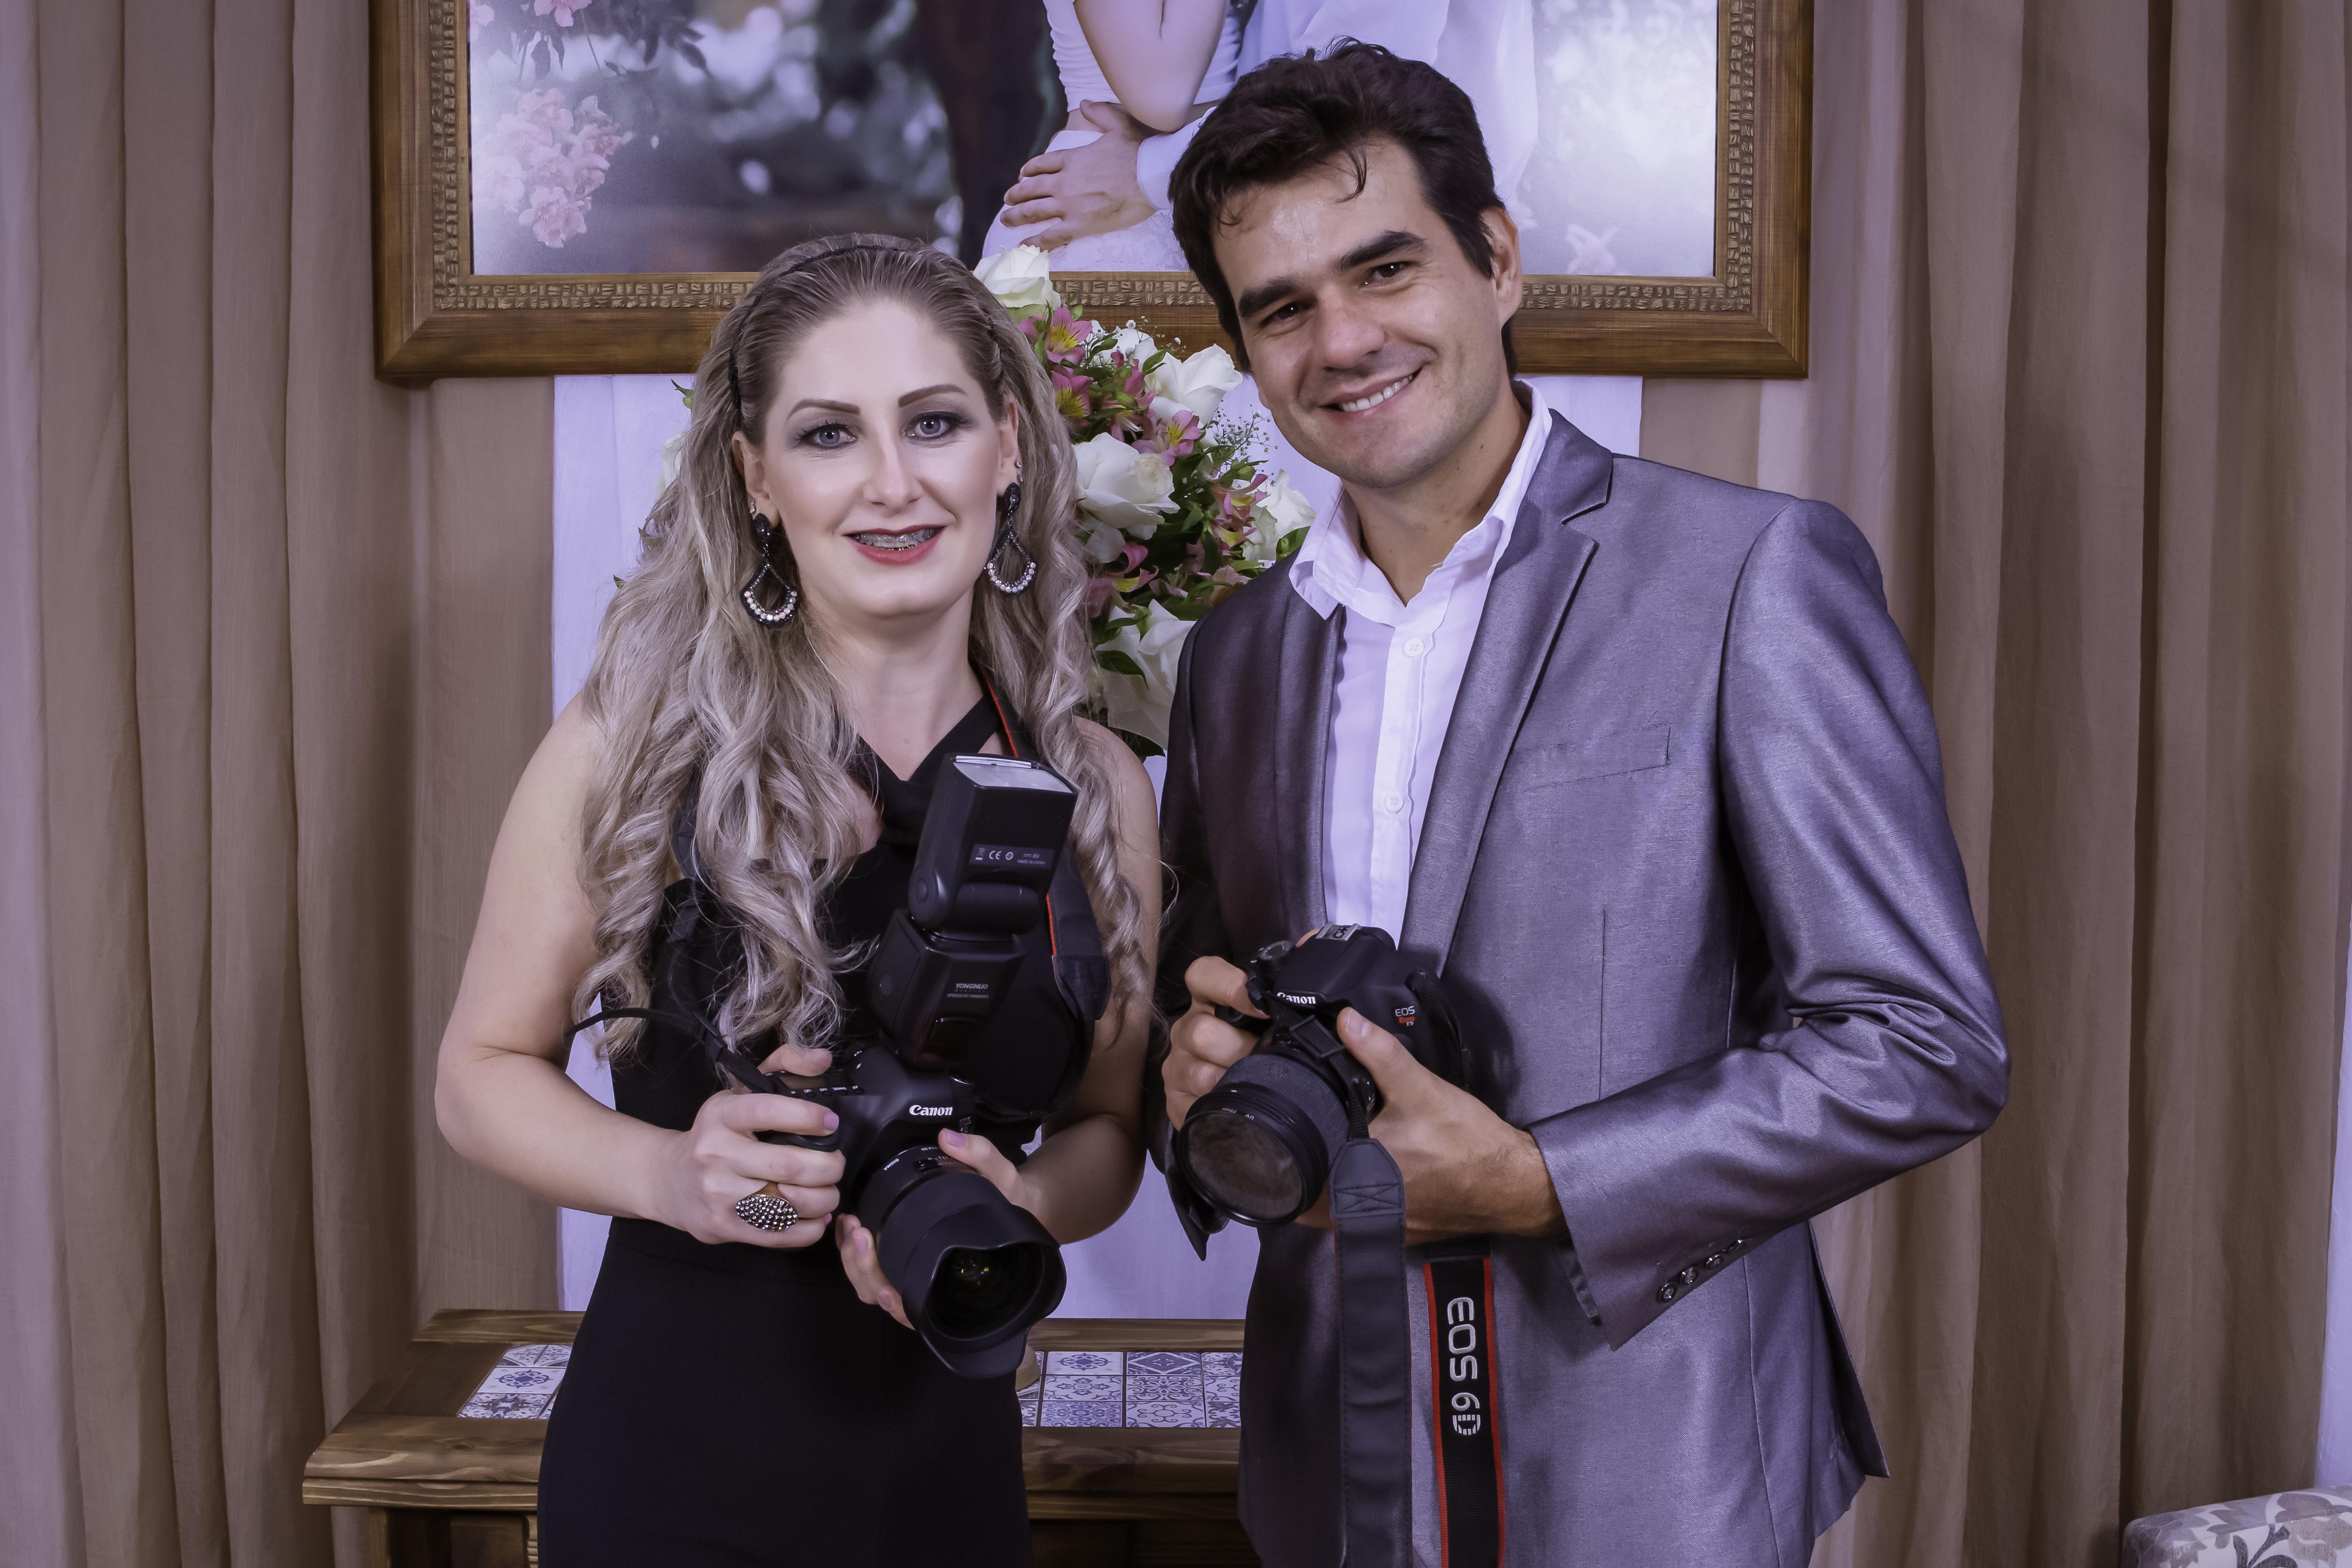 Sobre Fotografia de casamento Realeza-Paraná Patrícia Vargas e Maicon Vargas